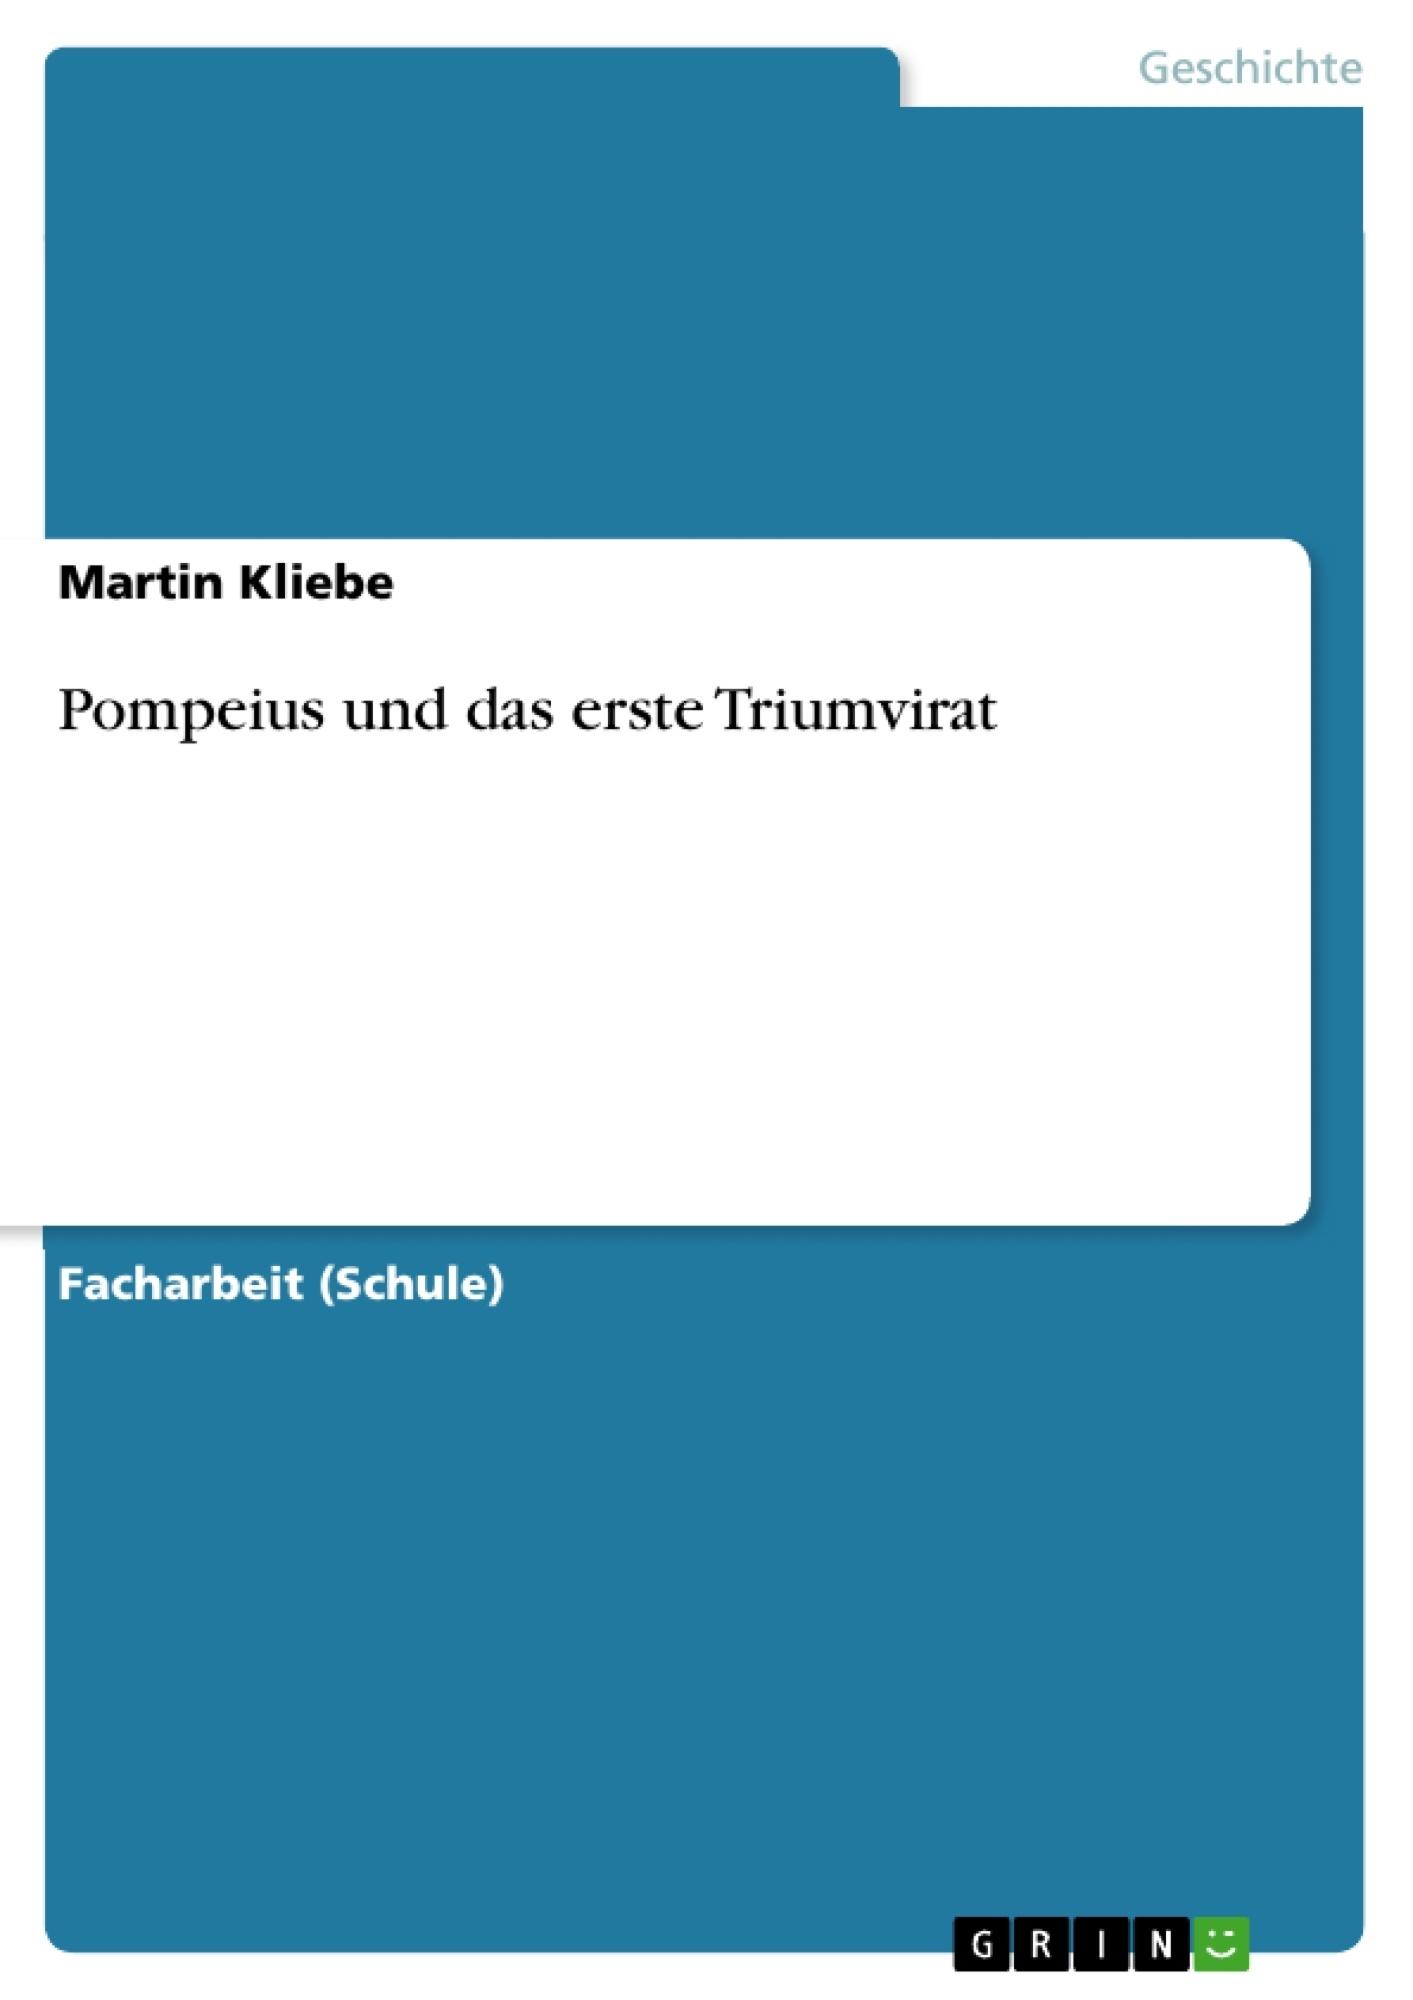 Titel: Pompeius und das erste Triumvirat